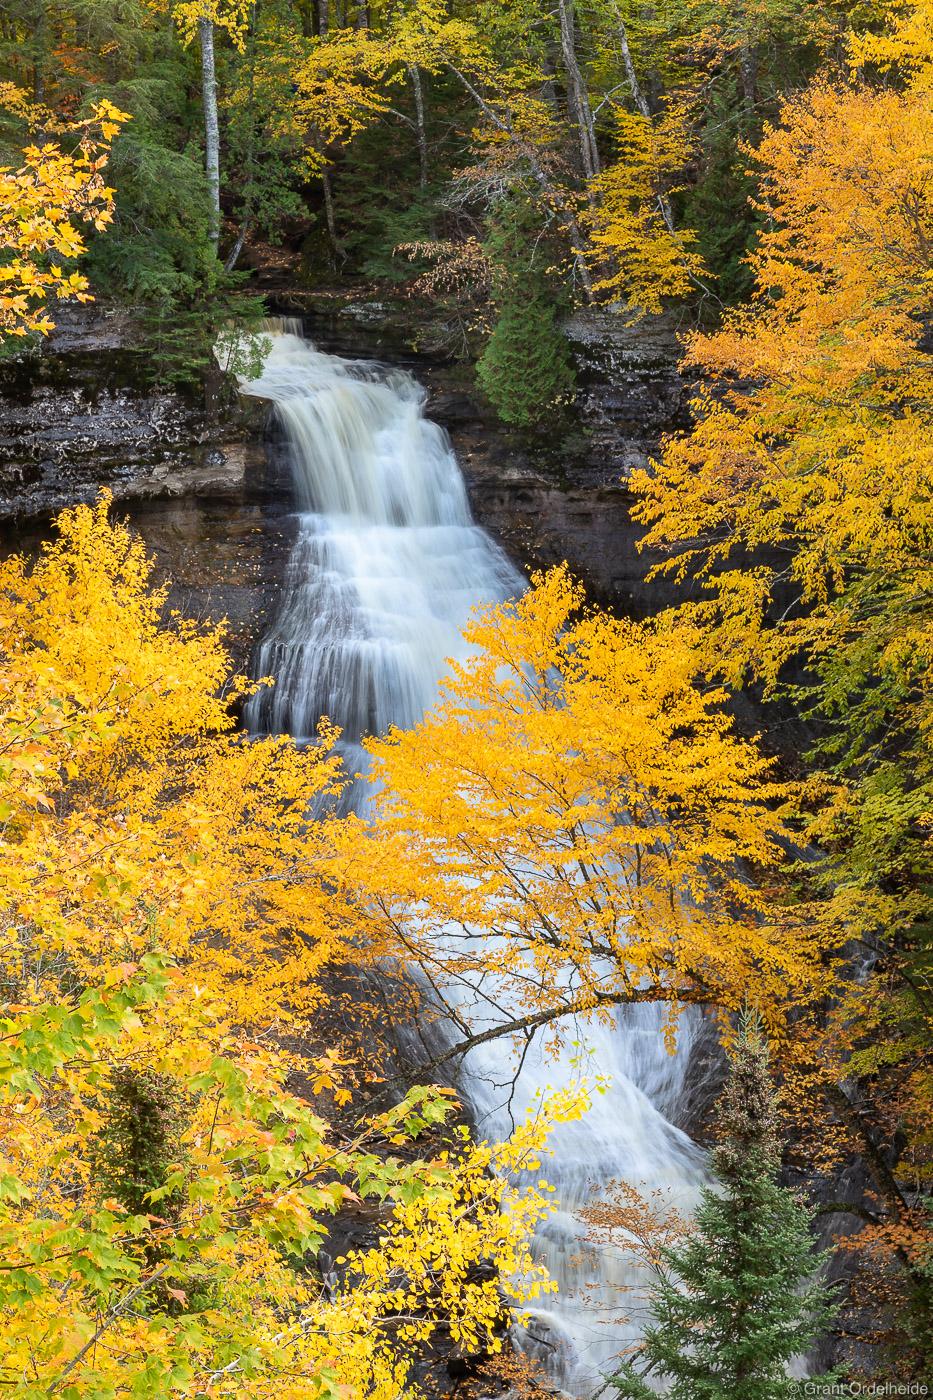 Vivid fall colors around Chapel Falls in Pictured Rocks National Lakeshore near Munising, Michigan.